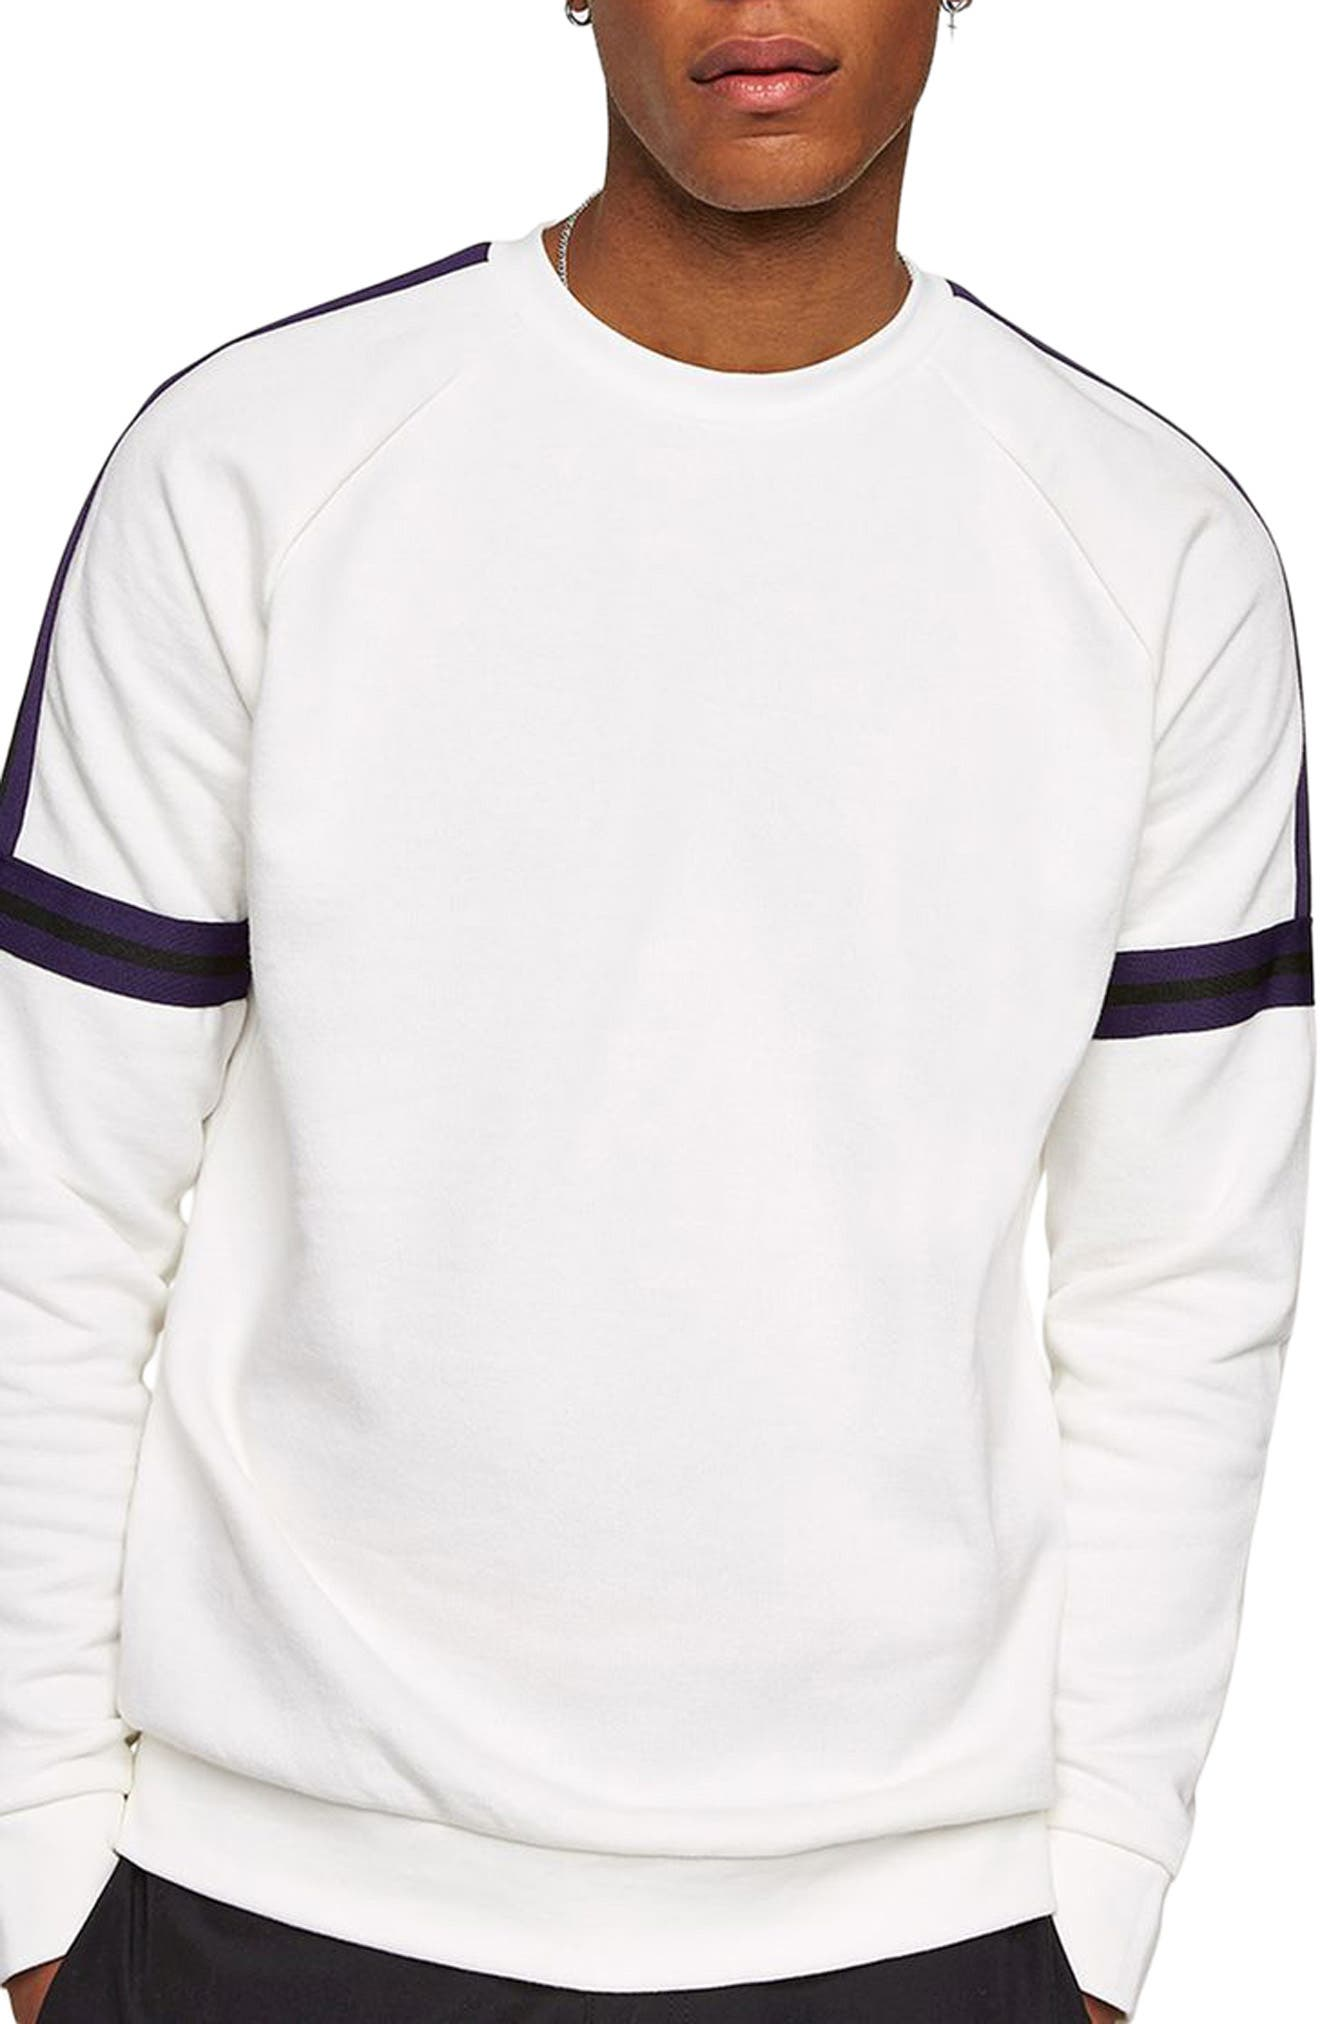 Tape Crewneck Sweatshirt,                             Main thumbnail 1, color,                             Cream